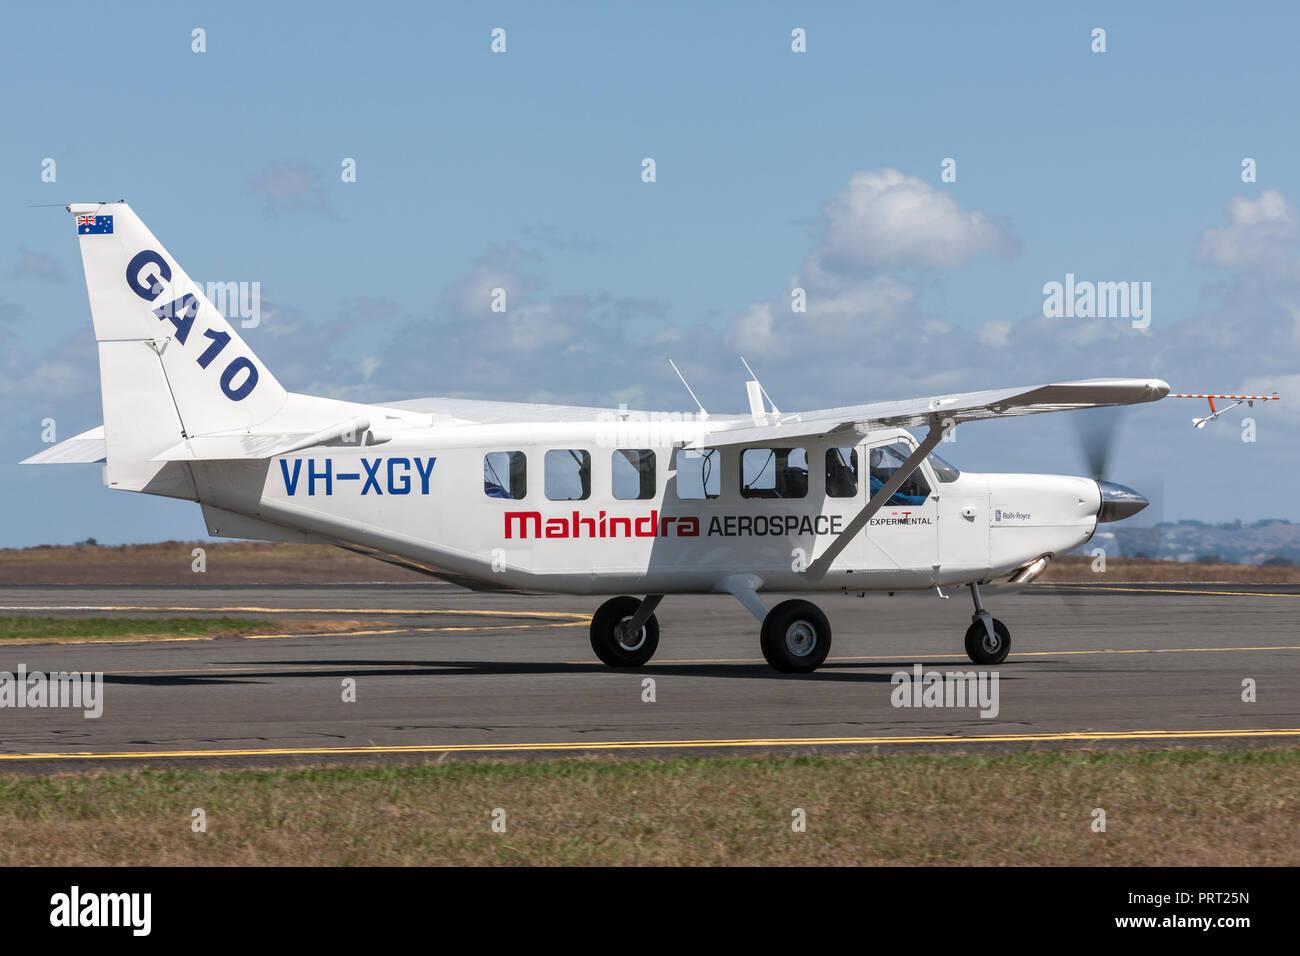 Mahindra Aerospace GA10 Airvan (VH-XGY) single engine utility aircraft. - Stock Image